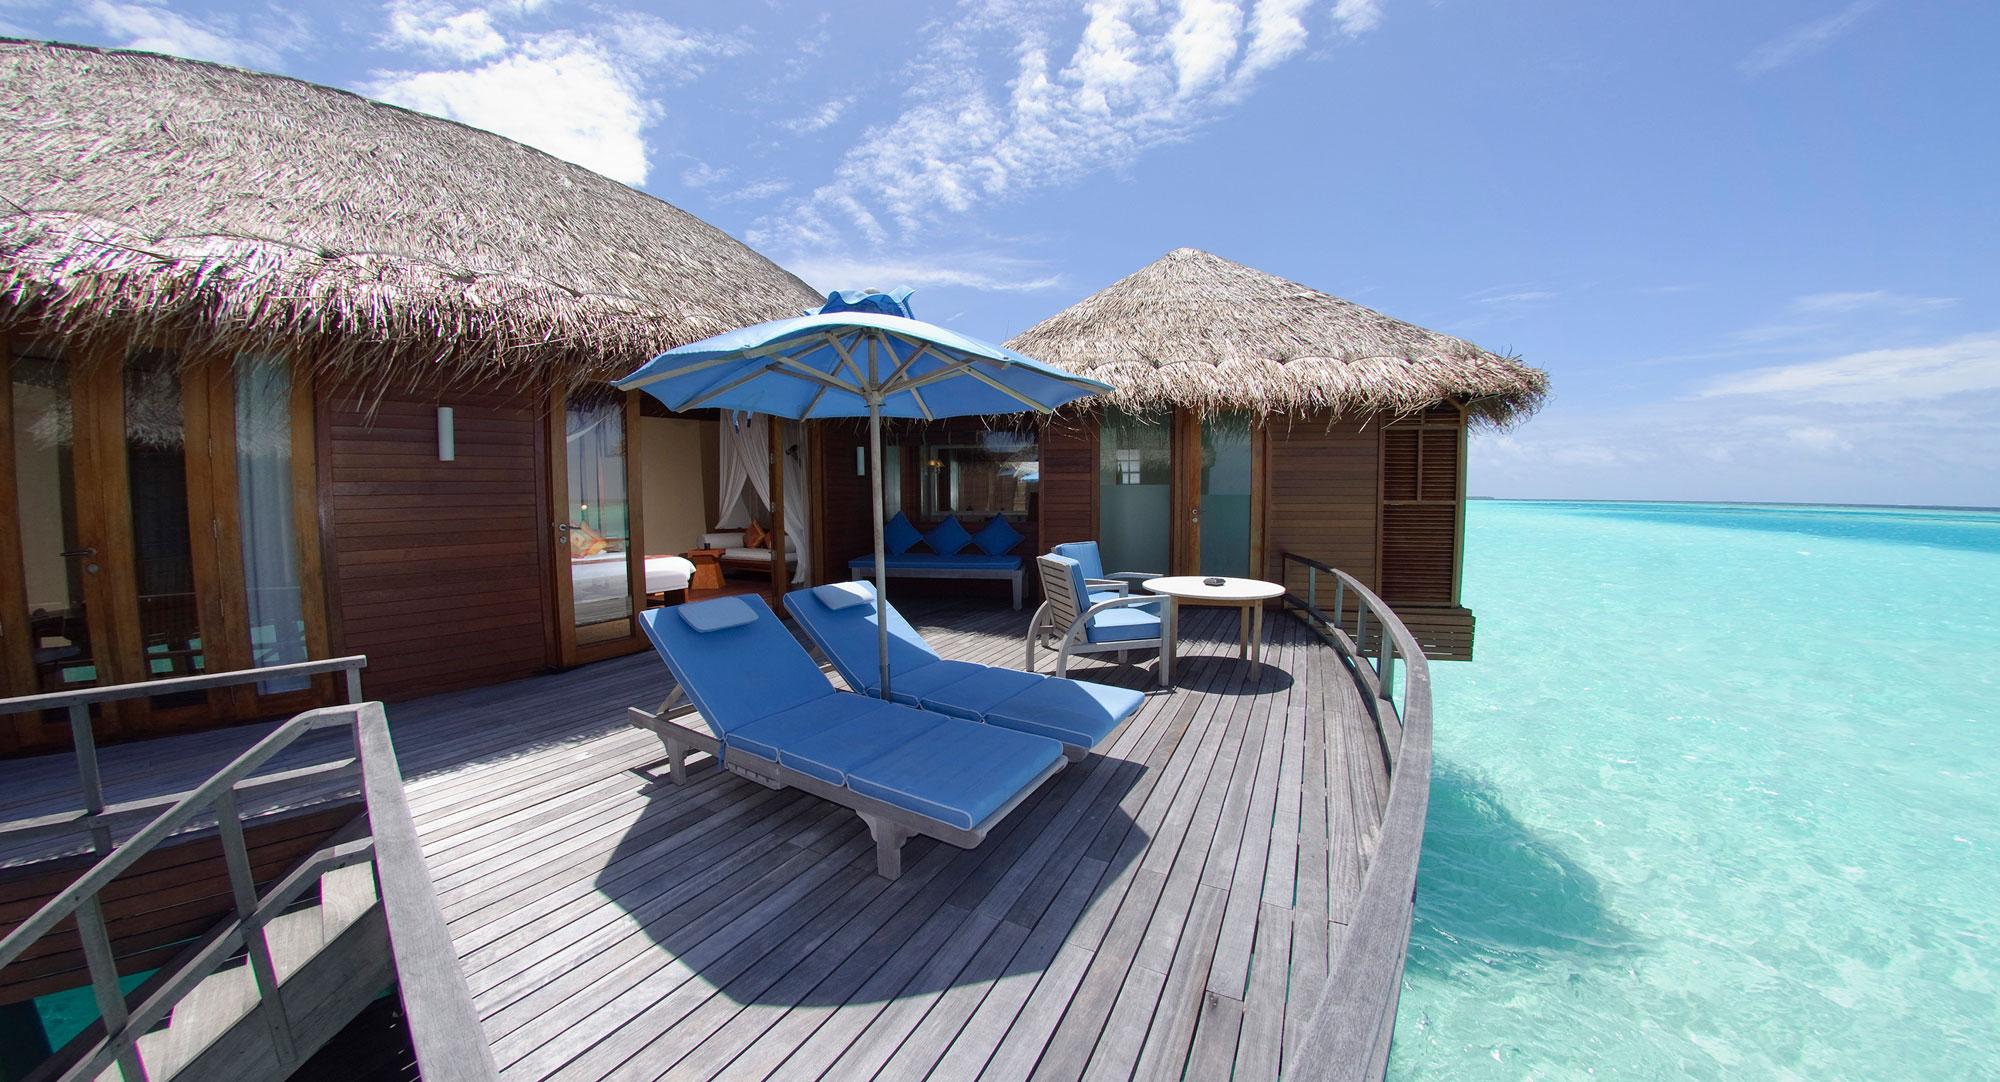 Anantara-Dhigu-Resort-07